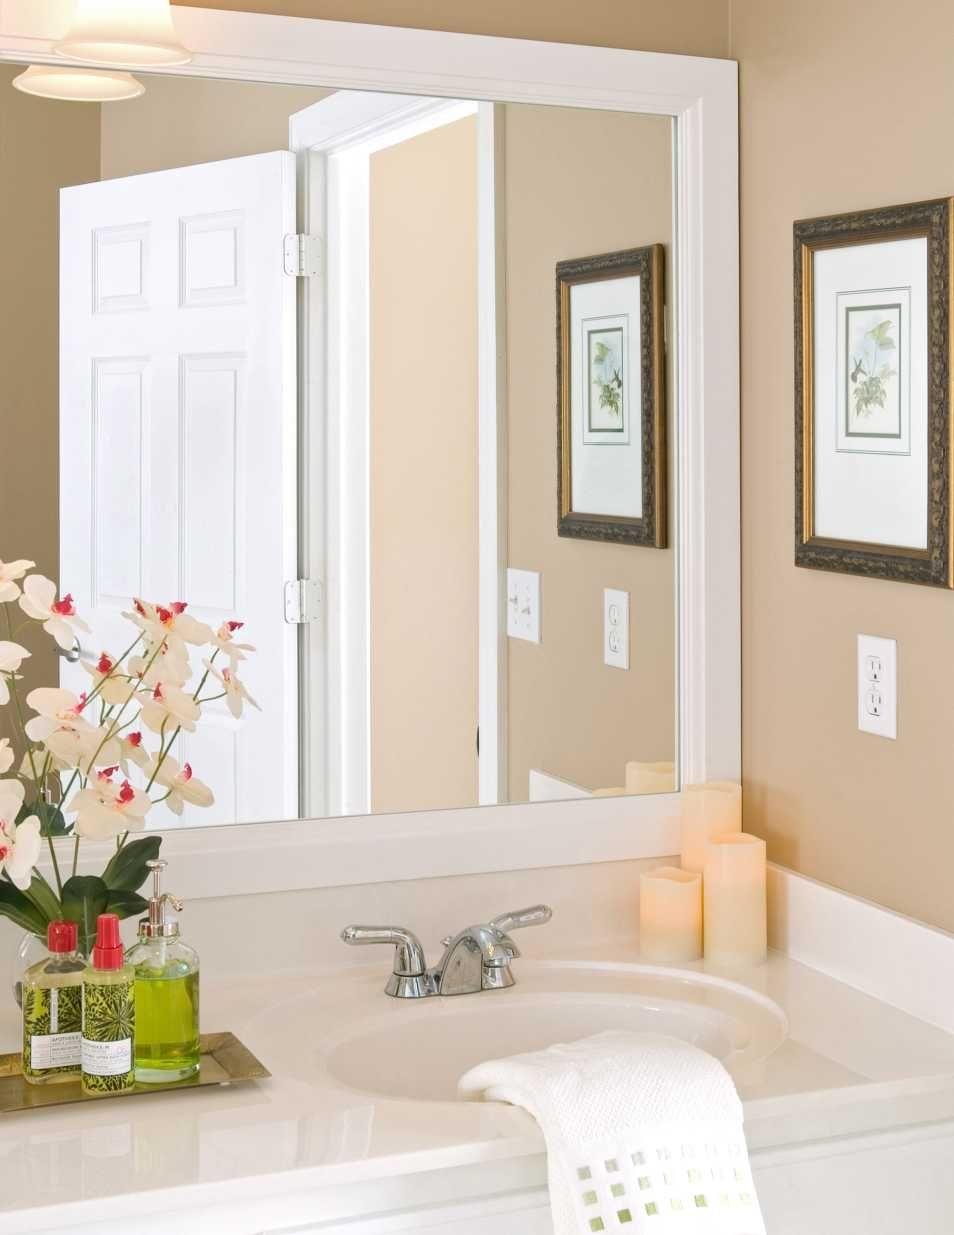 Bathroom : Bathroom Mirror Frame White Make The Mirror Glass ...